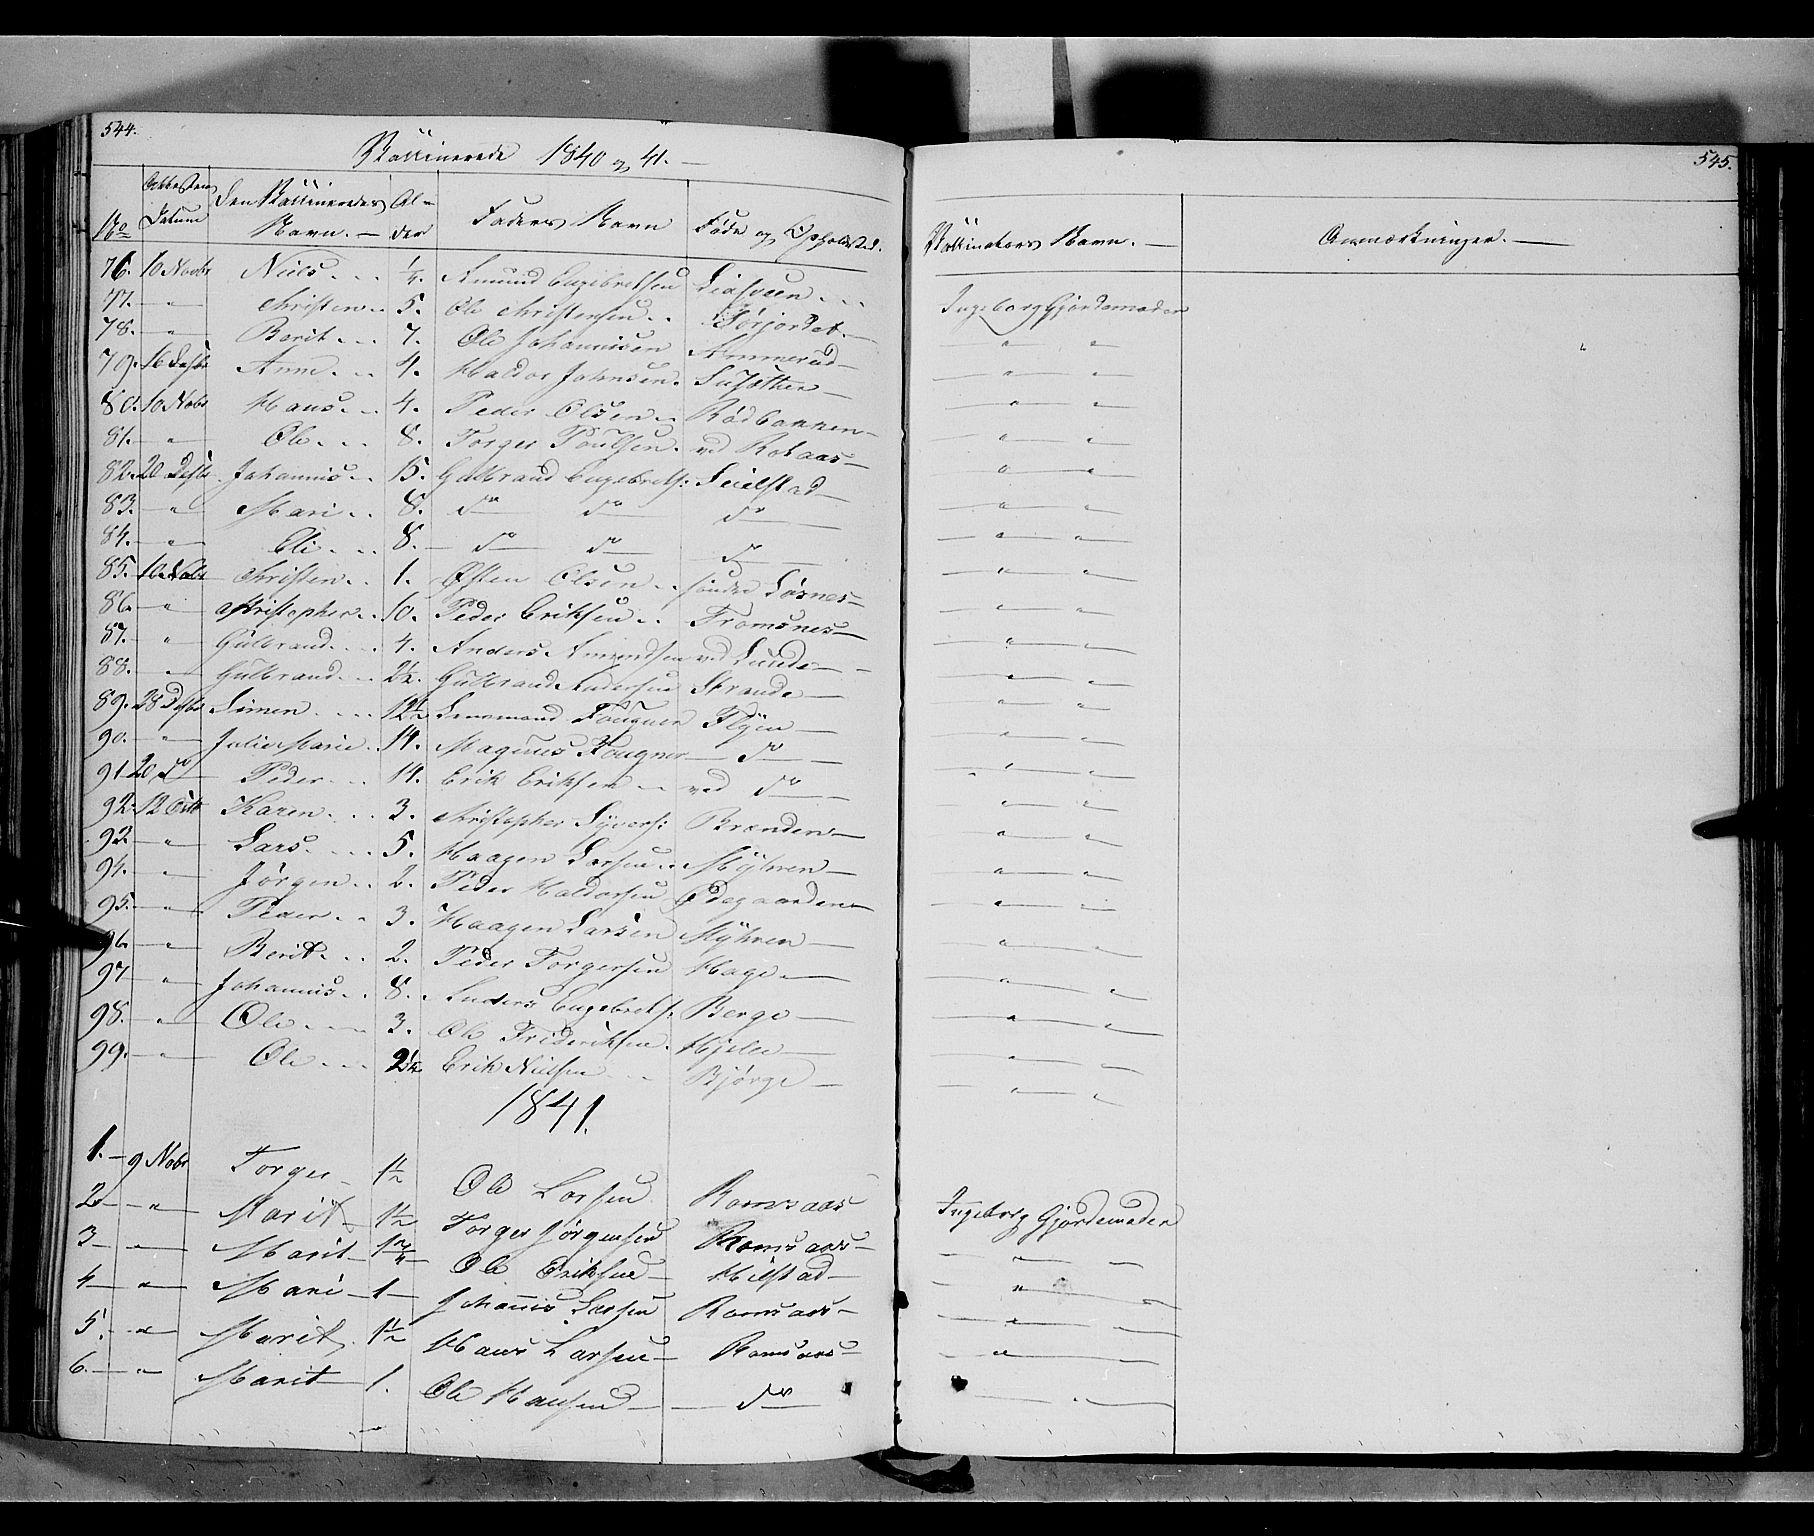 SAH, Ringebu prestekontor, Ministerialbok nr. 5, 1839-1848, s. 544-545